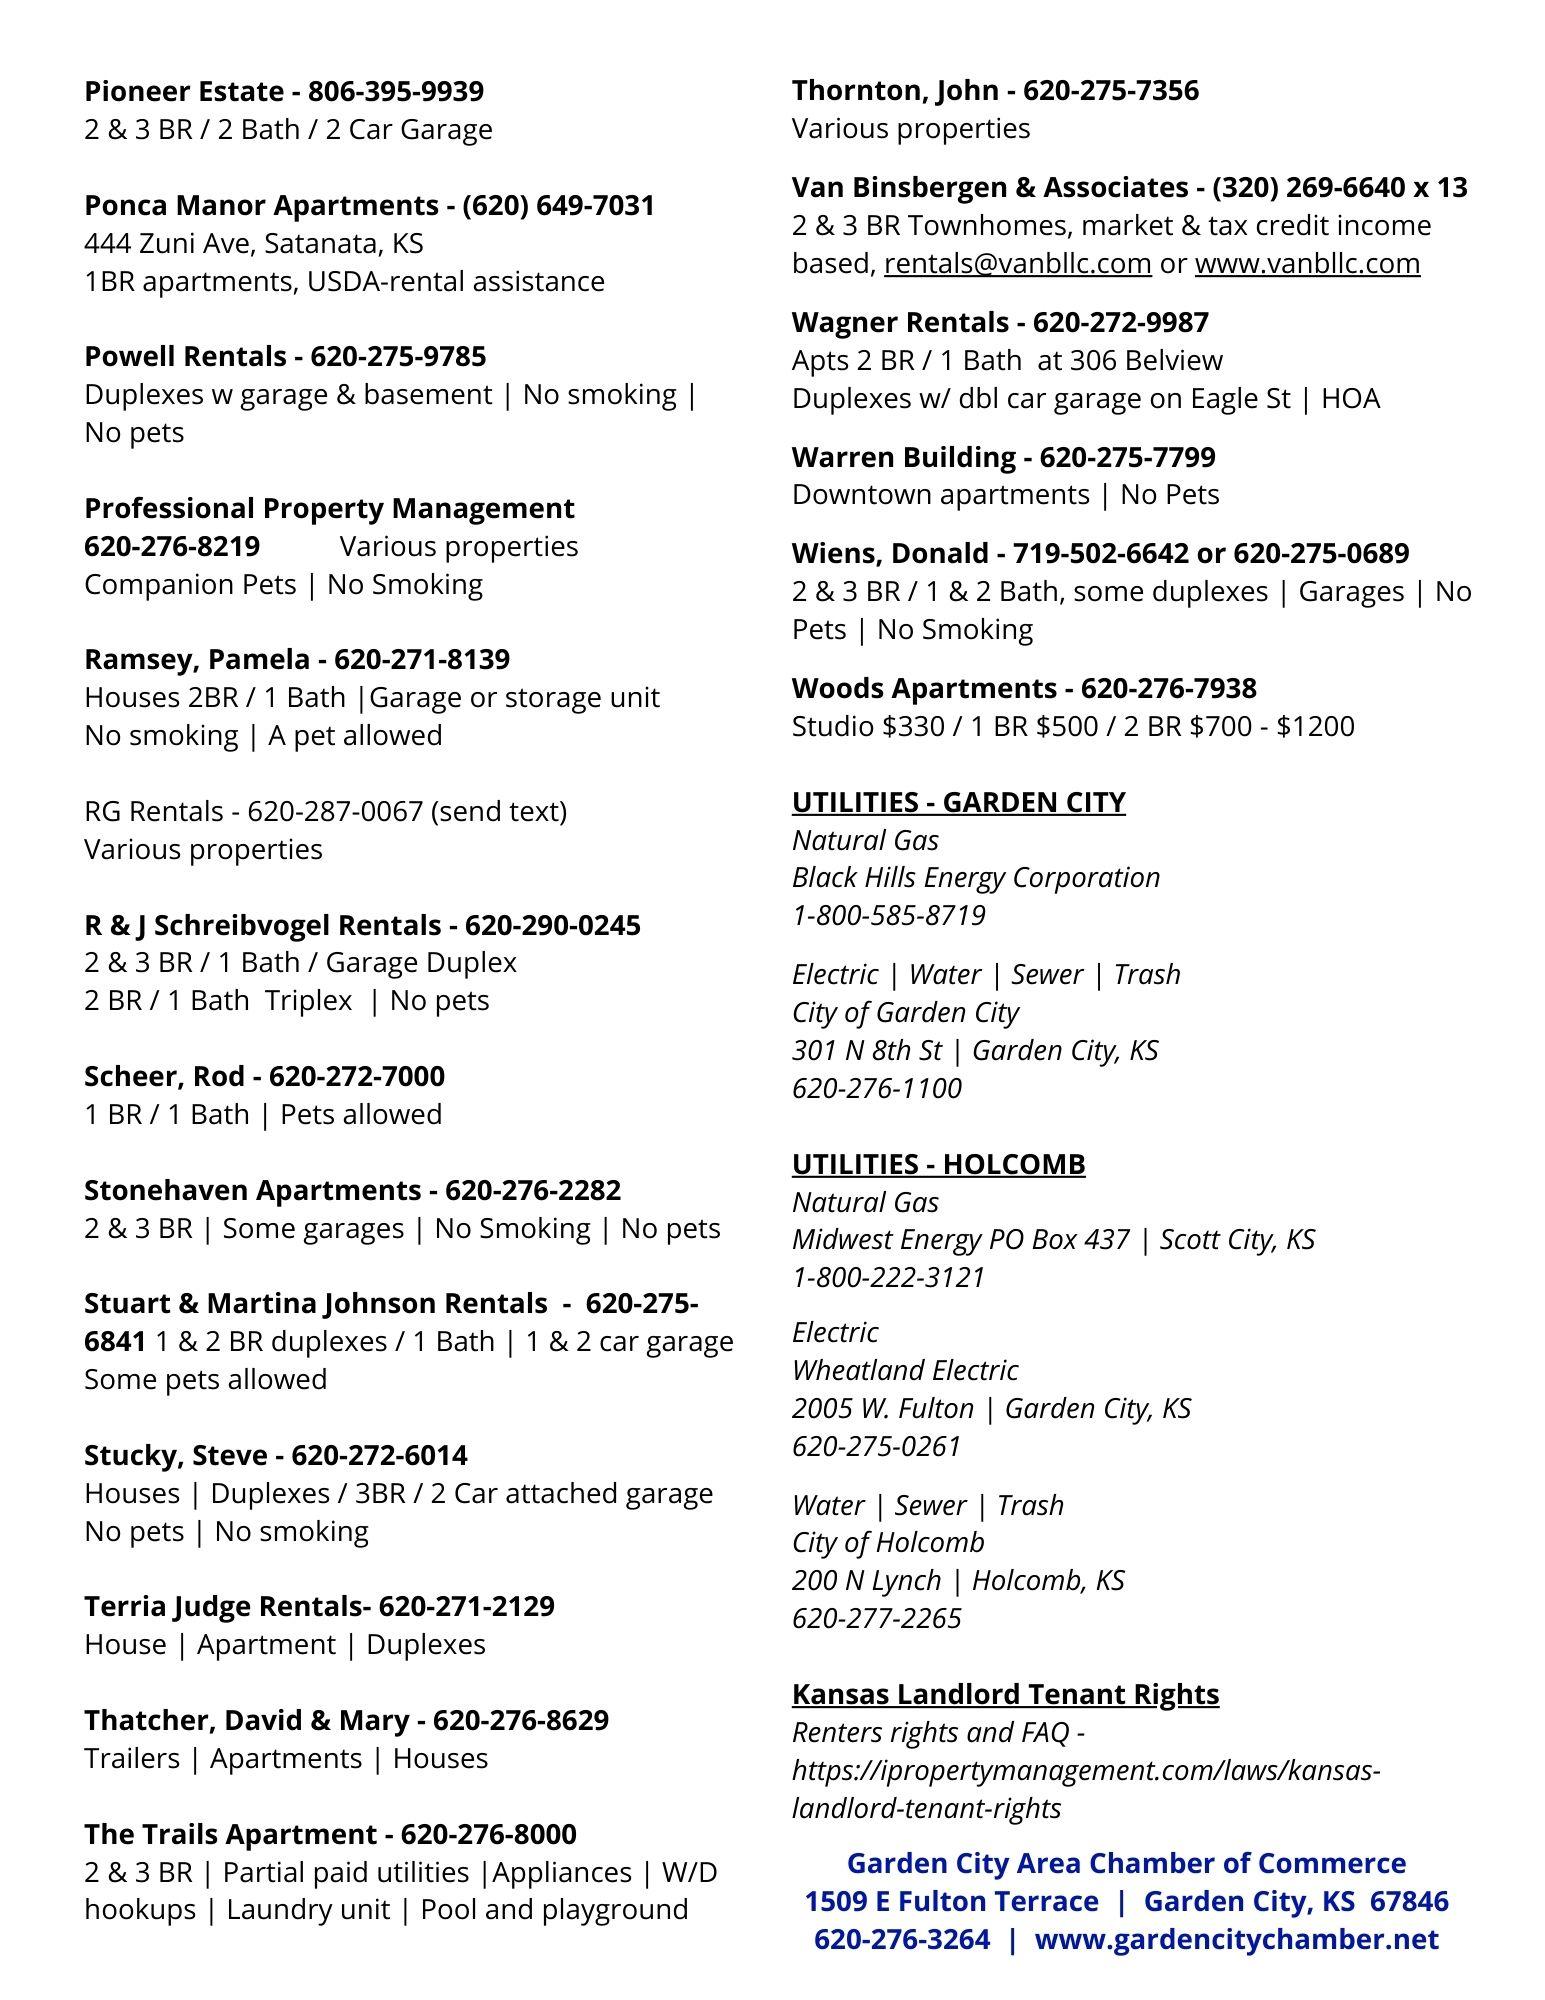 Rental-Page-2-April-2021.jpg